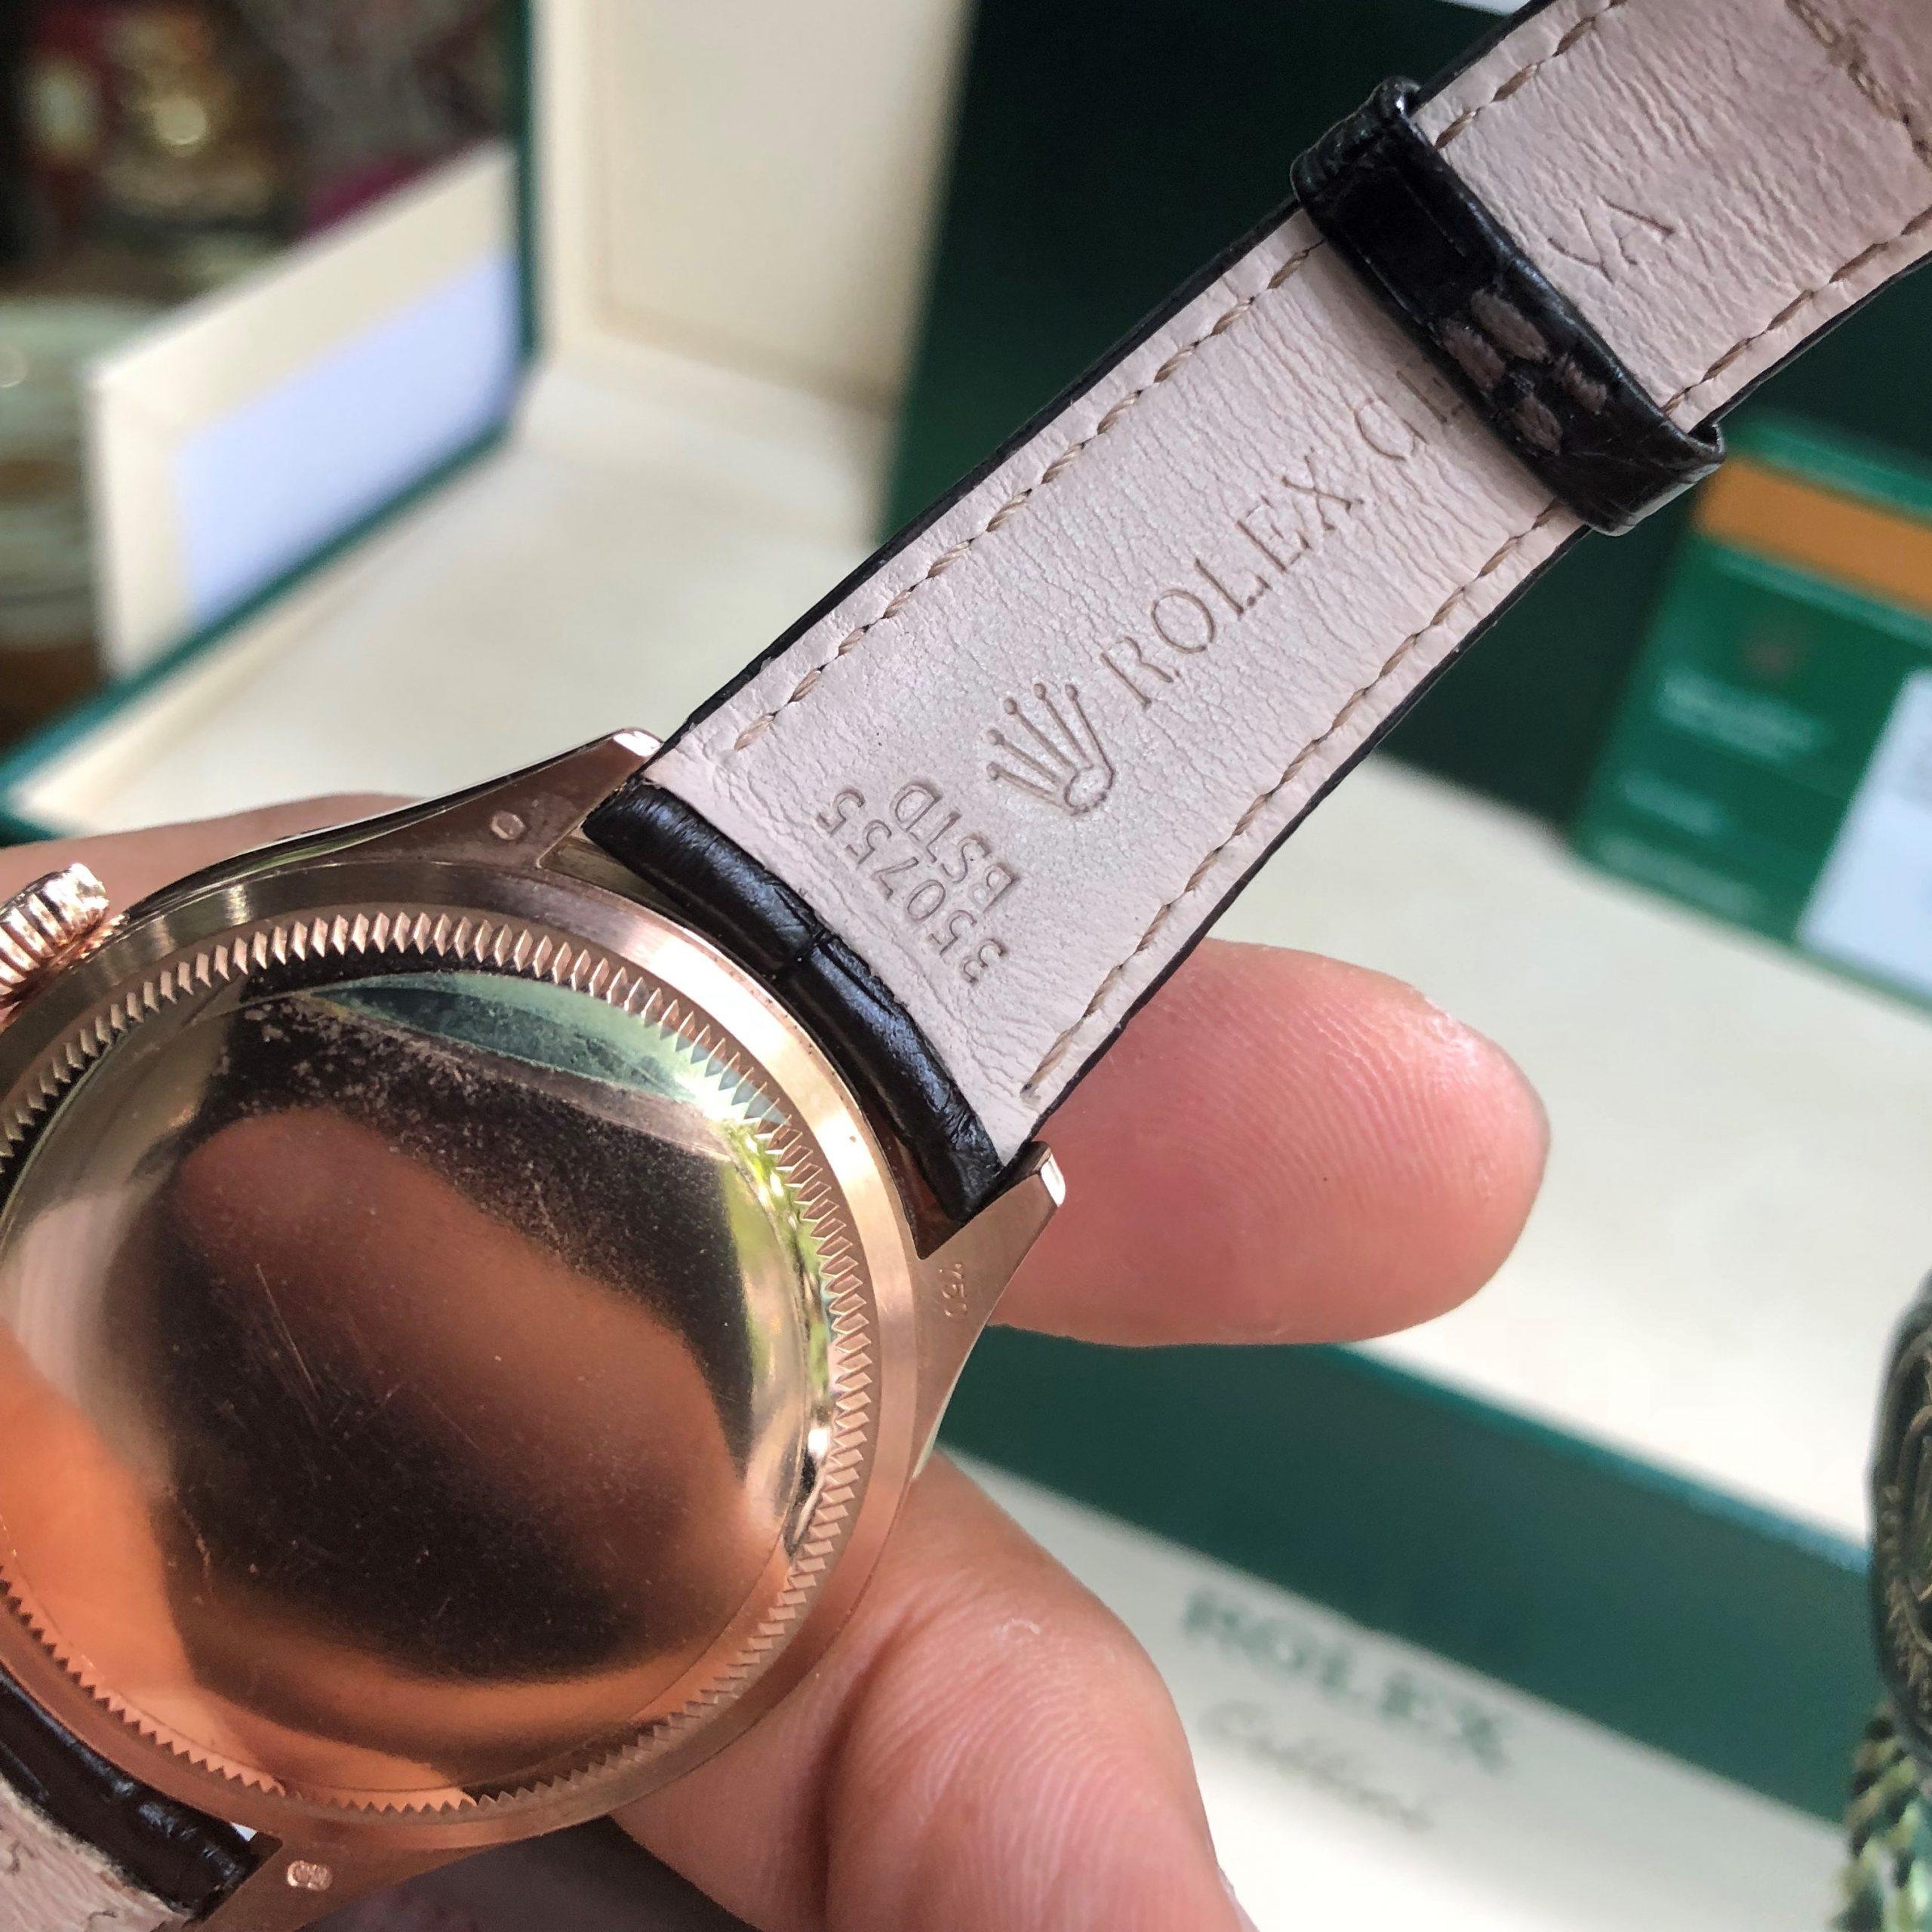 Rolex Cellini 50505 mặt trắng vàng hồng 18k Size 39 Fullbox 2017